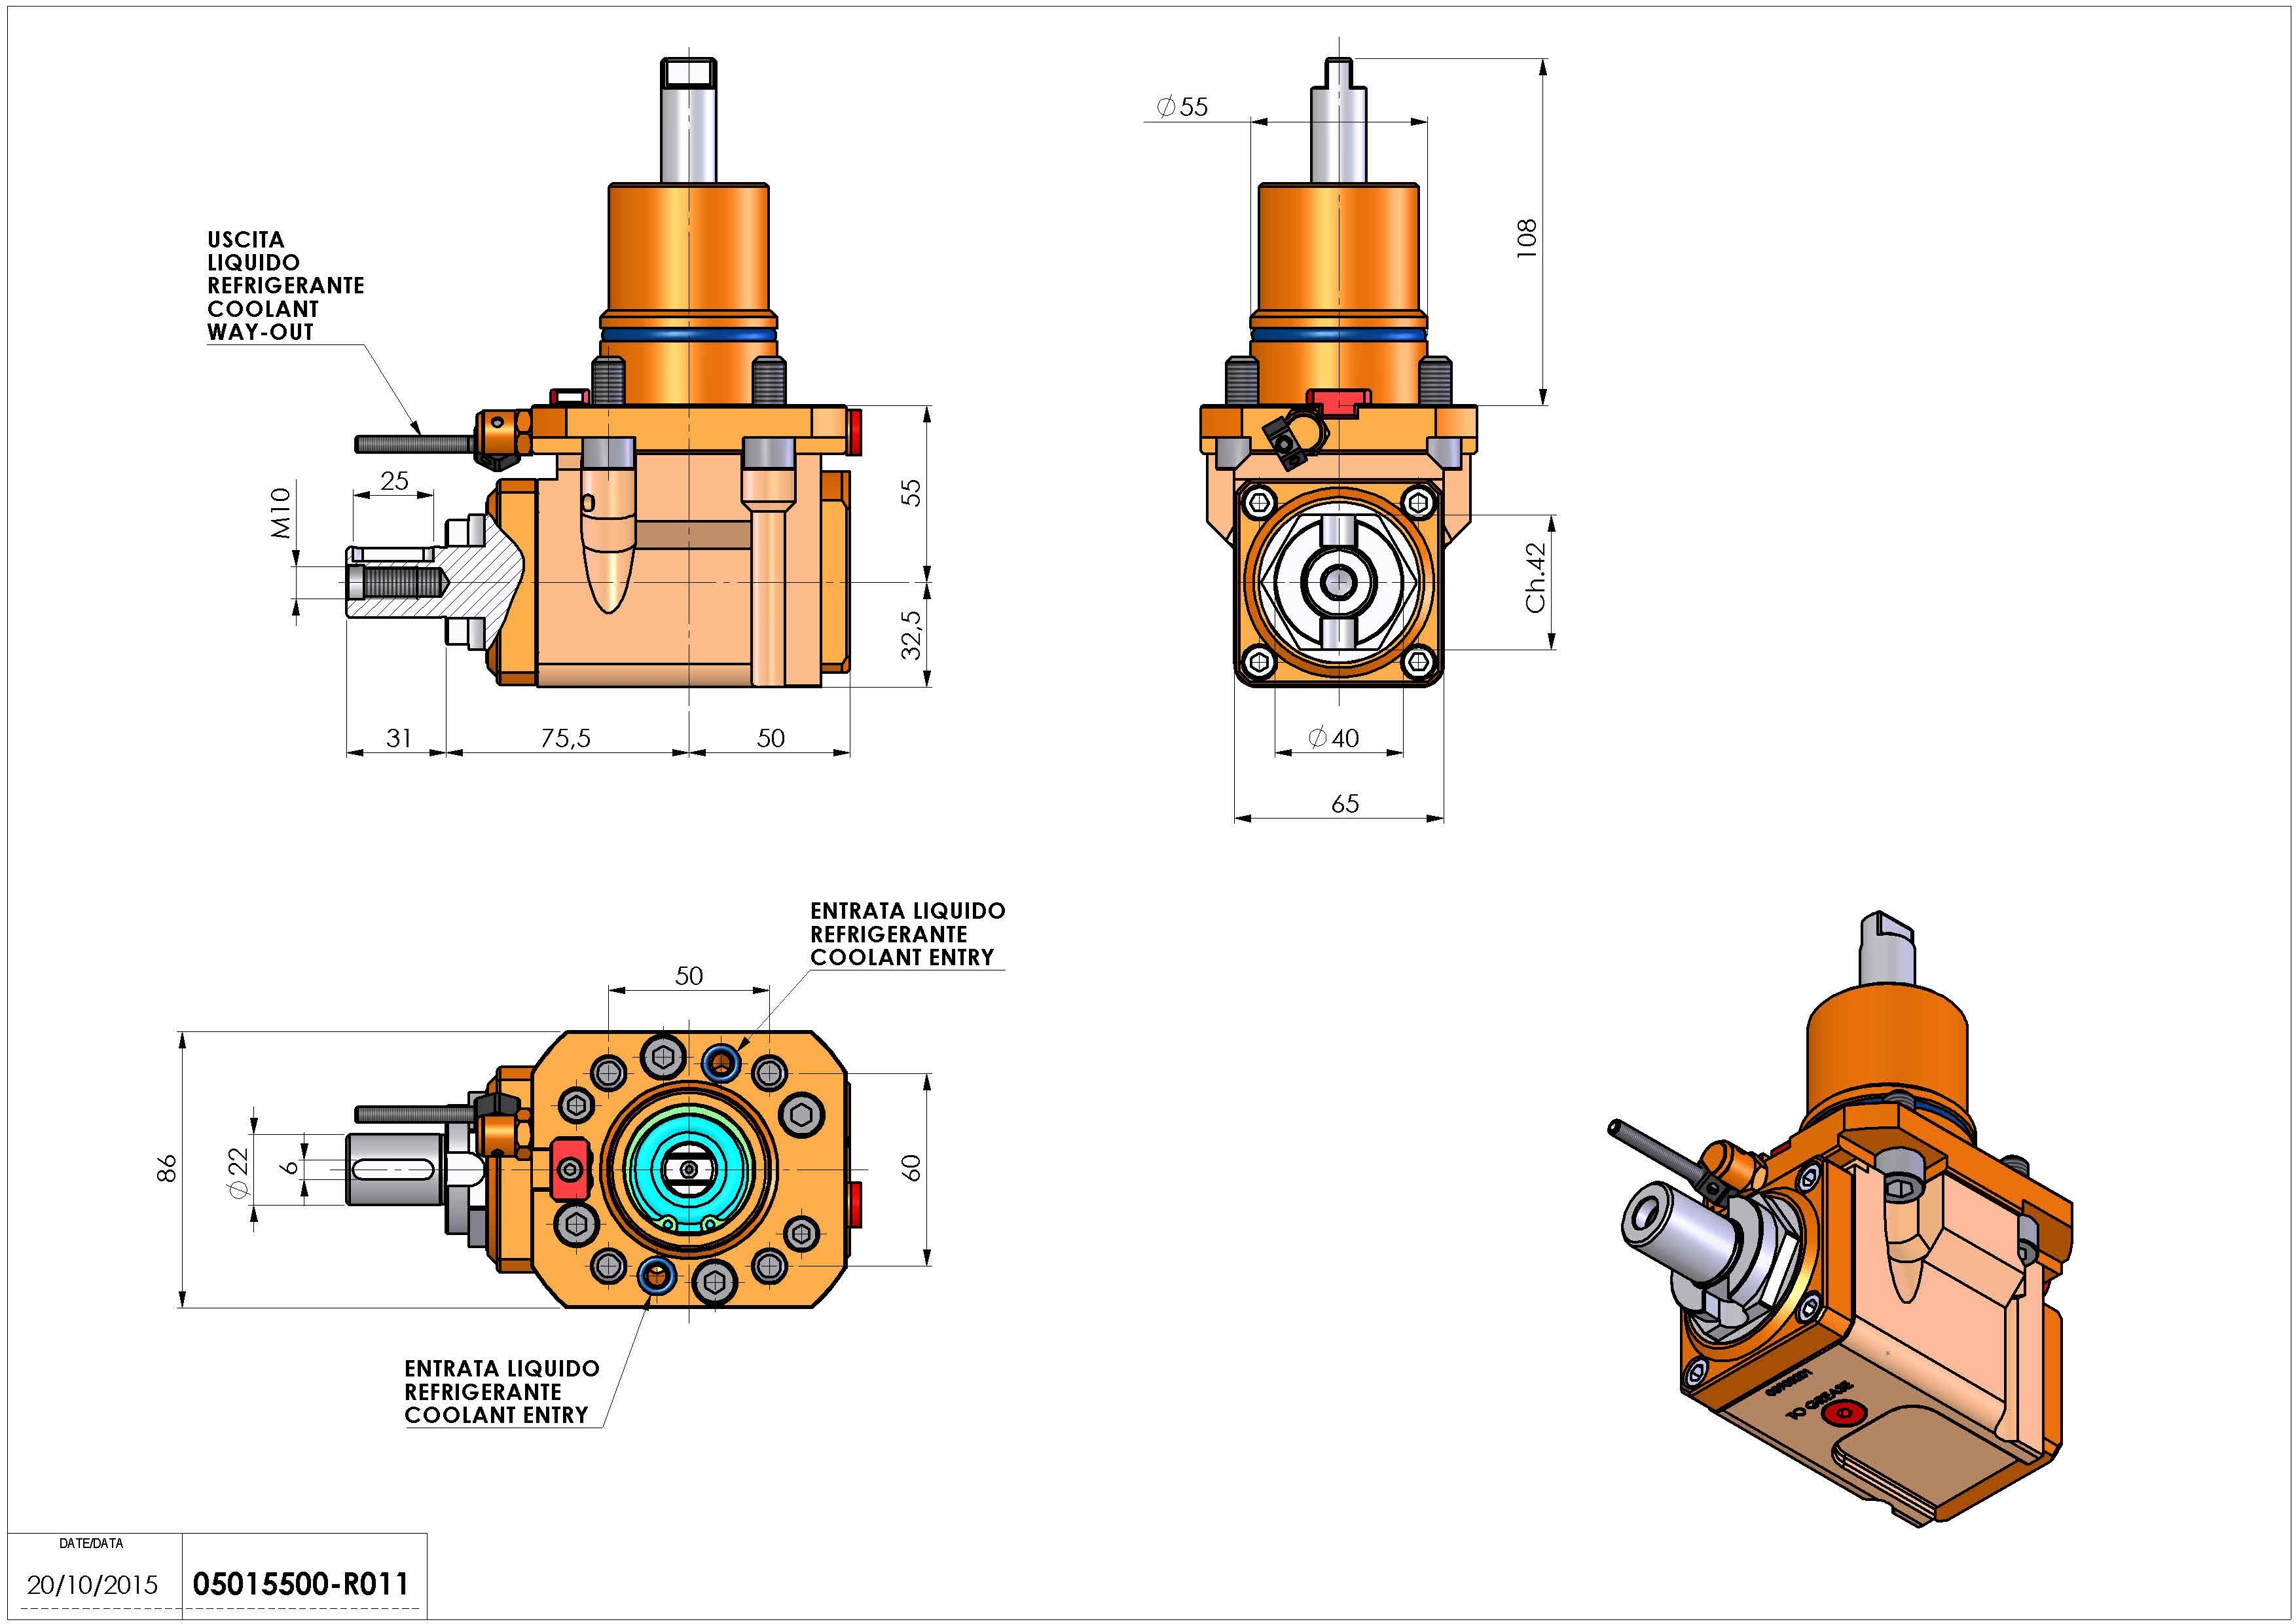 Technical image - LT-A D55 DIN138-22 H55 NK.